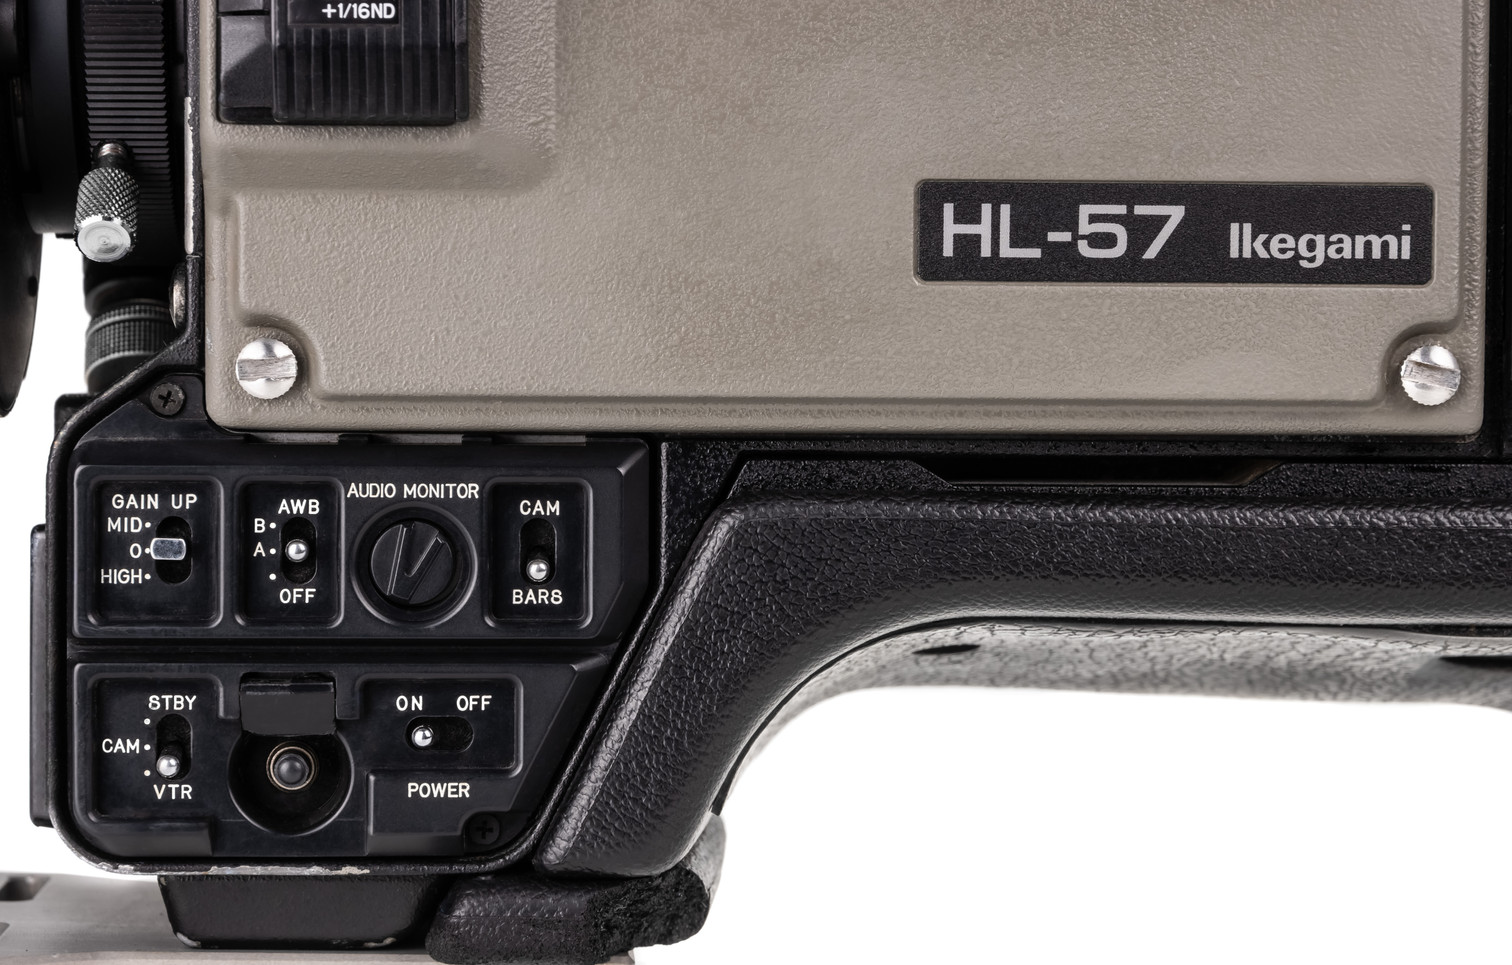 Ikegami HL-57 - 4.jpg